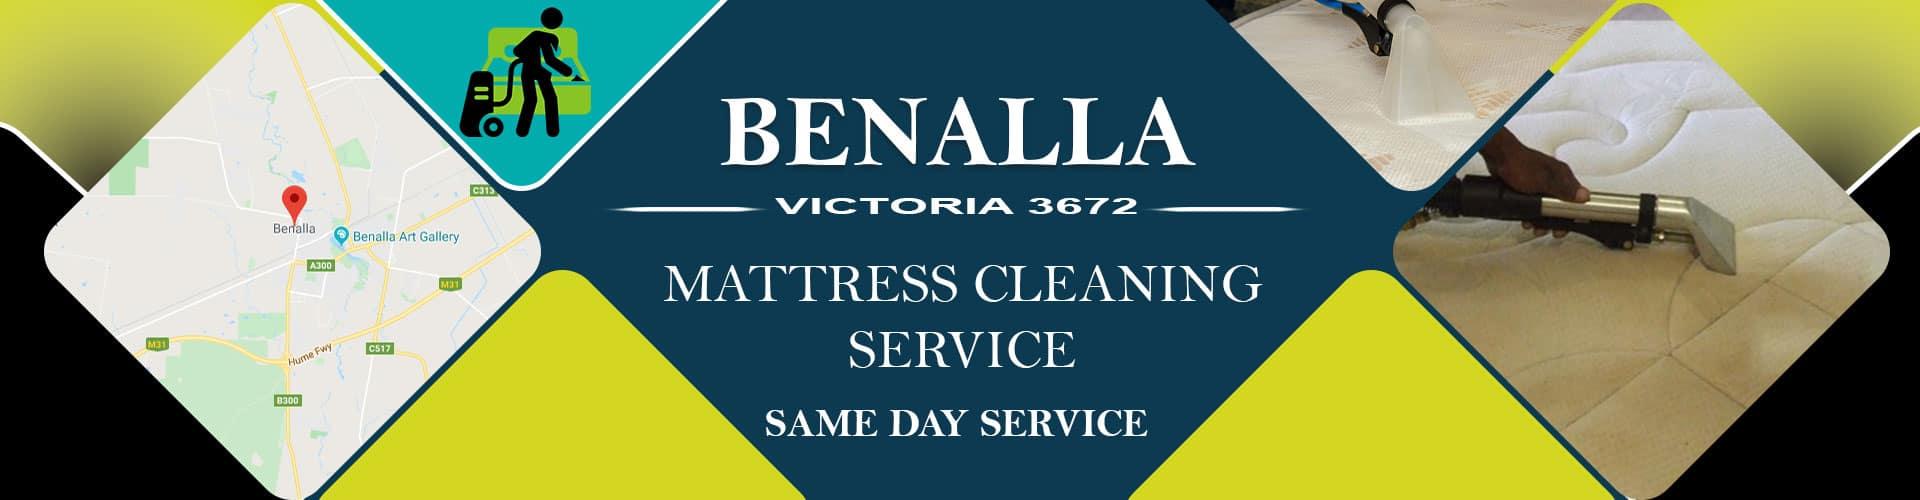 Mattress Cleaning Benalla